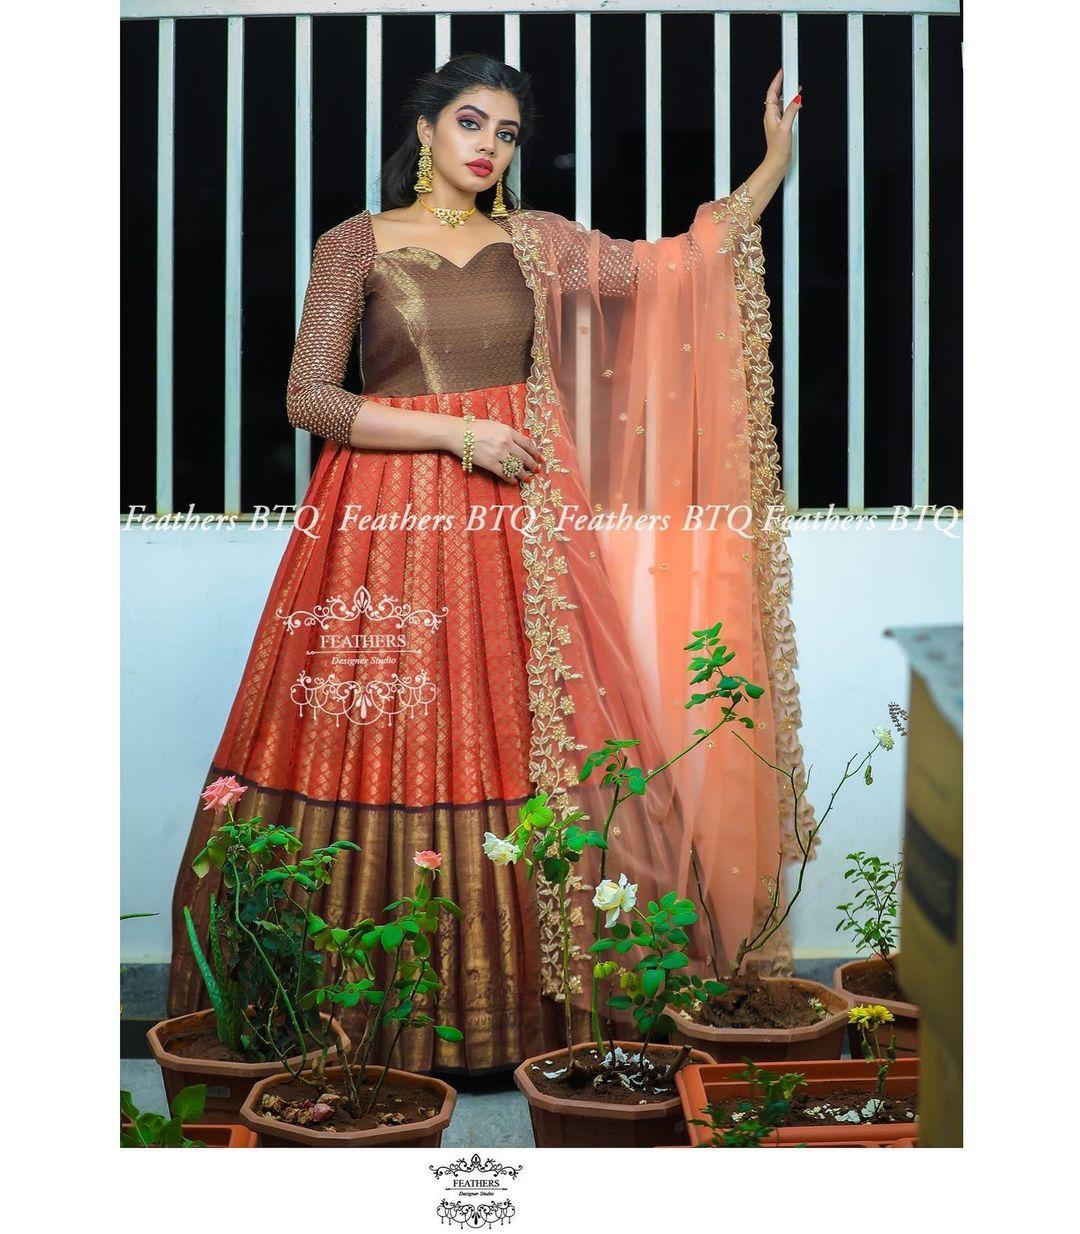 Stunning pattu long frock with big pattu border and jari sleeves and net dupatta. 2021-06-02